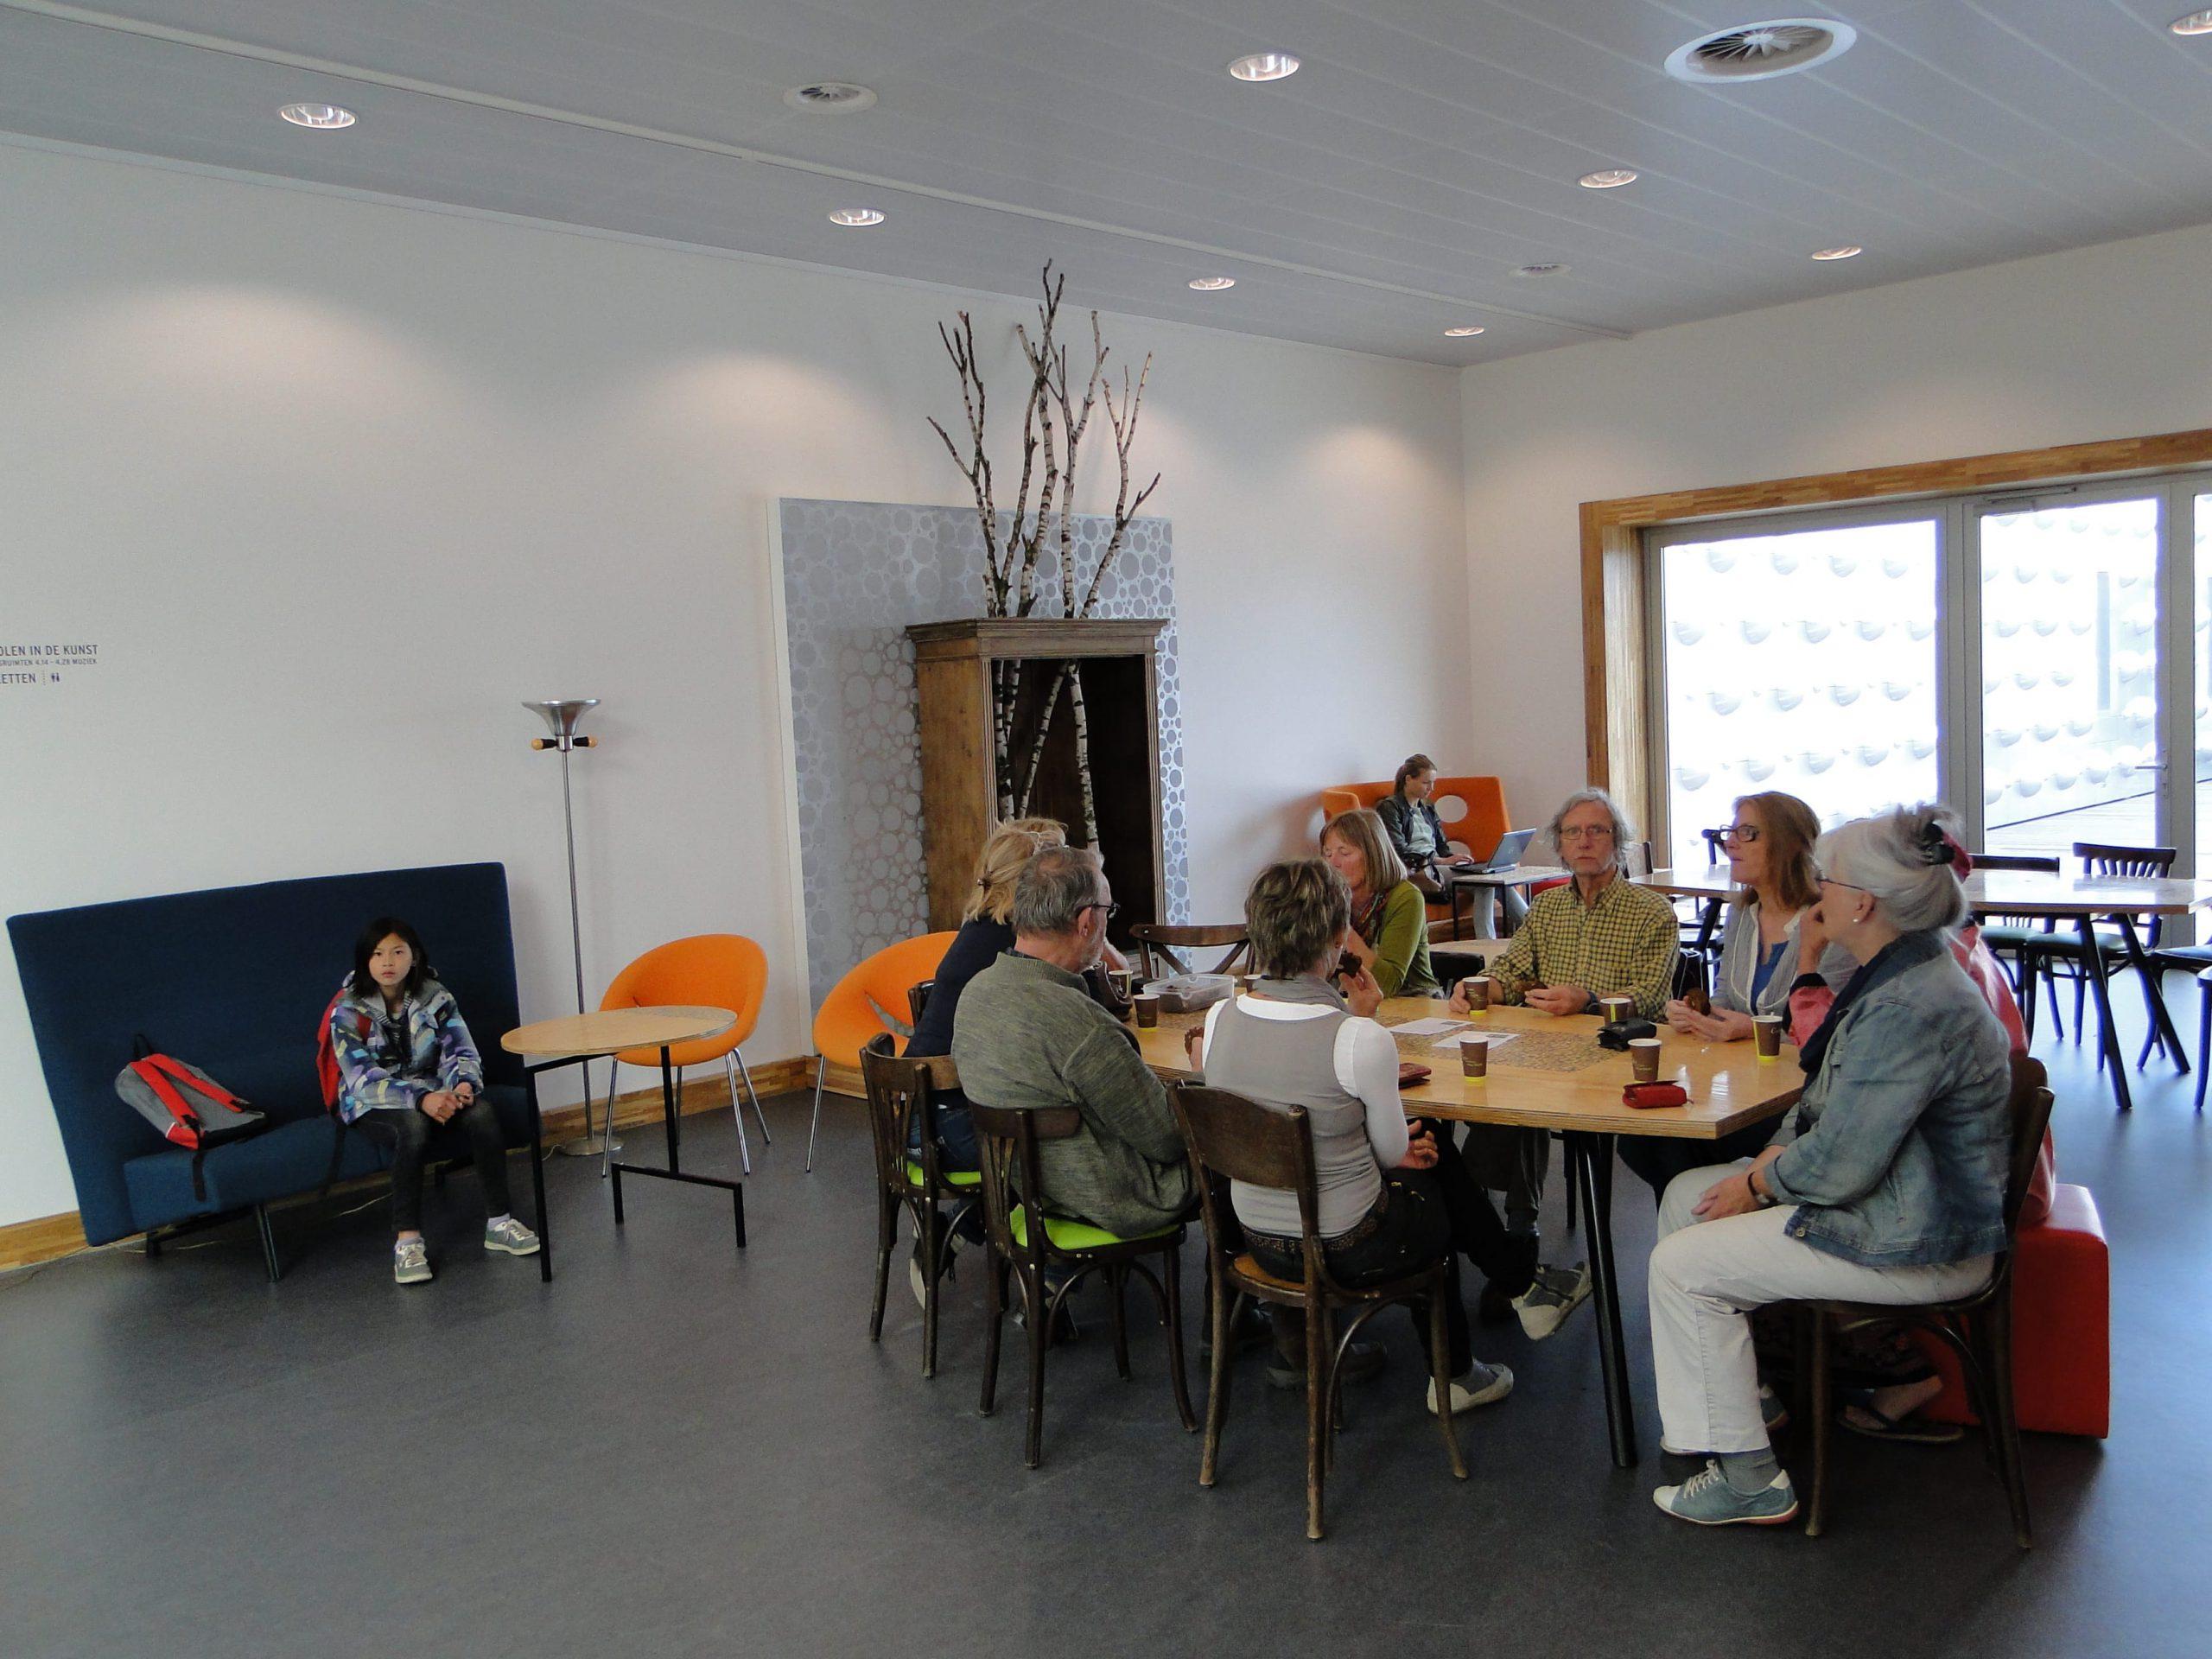 vergaderhoekje in het MFA Eemhuis in Amersfoort